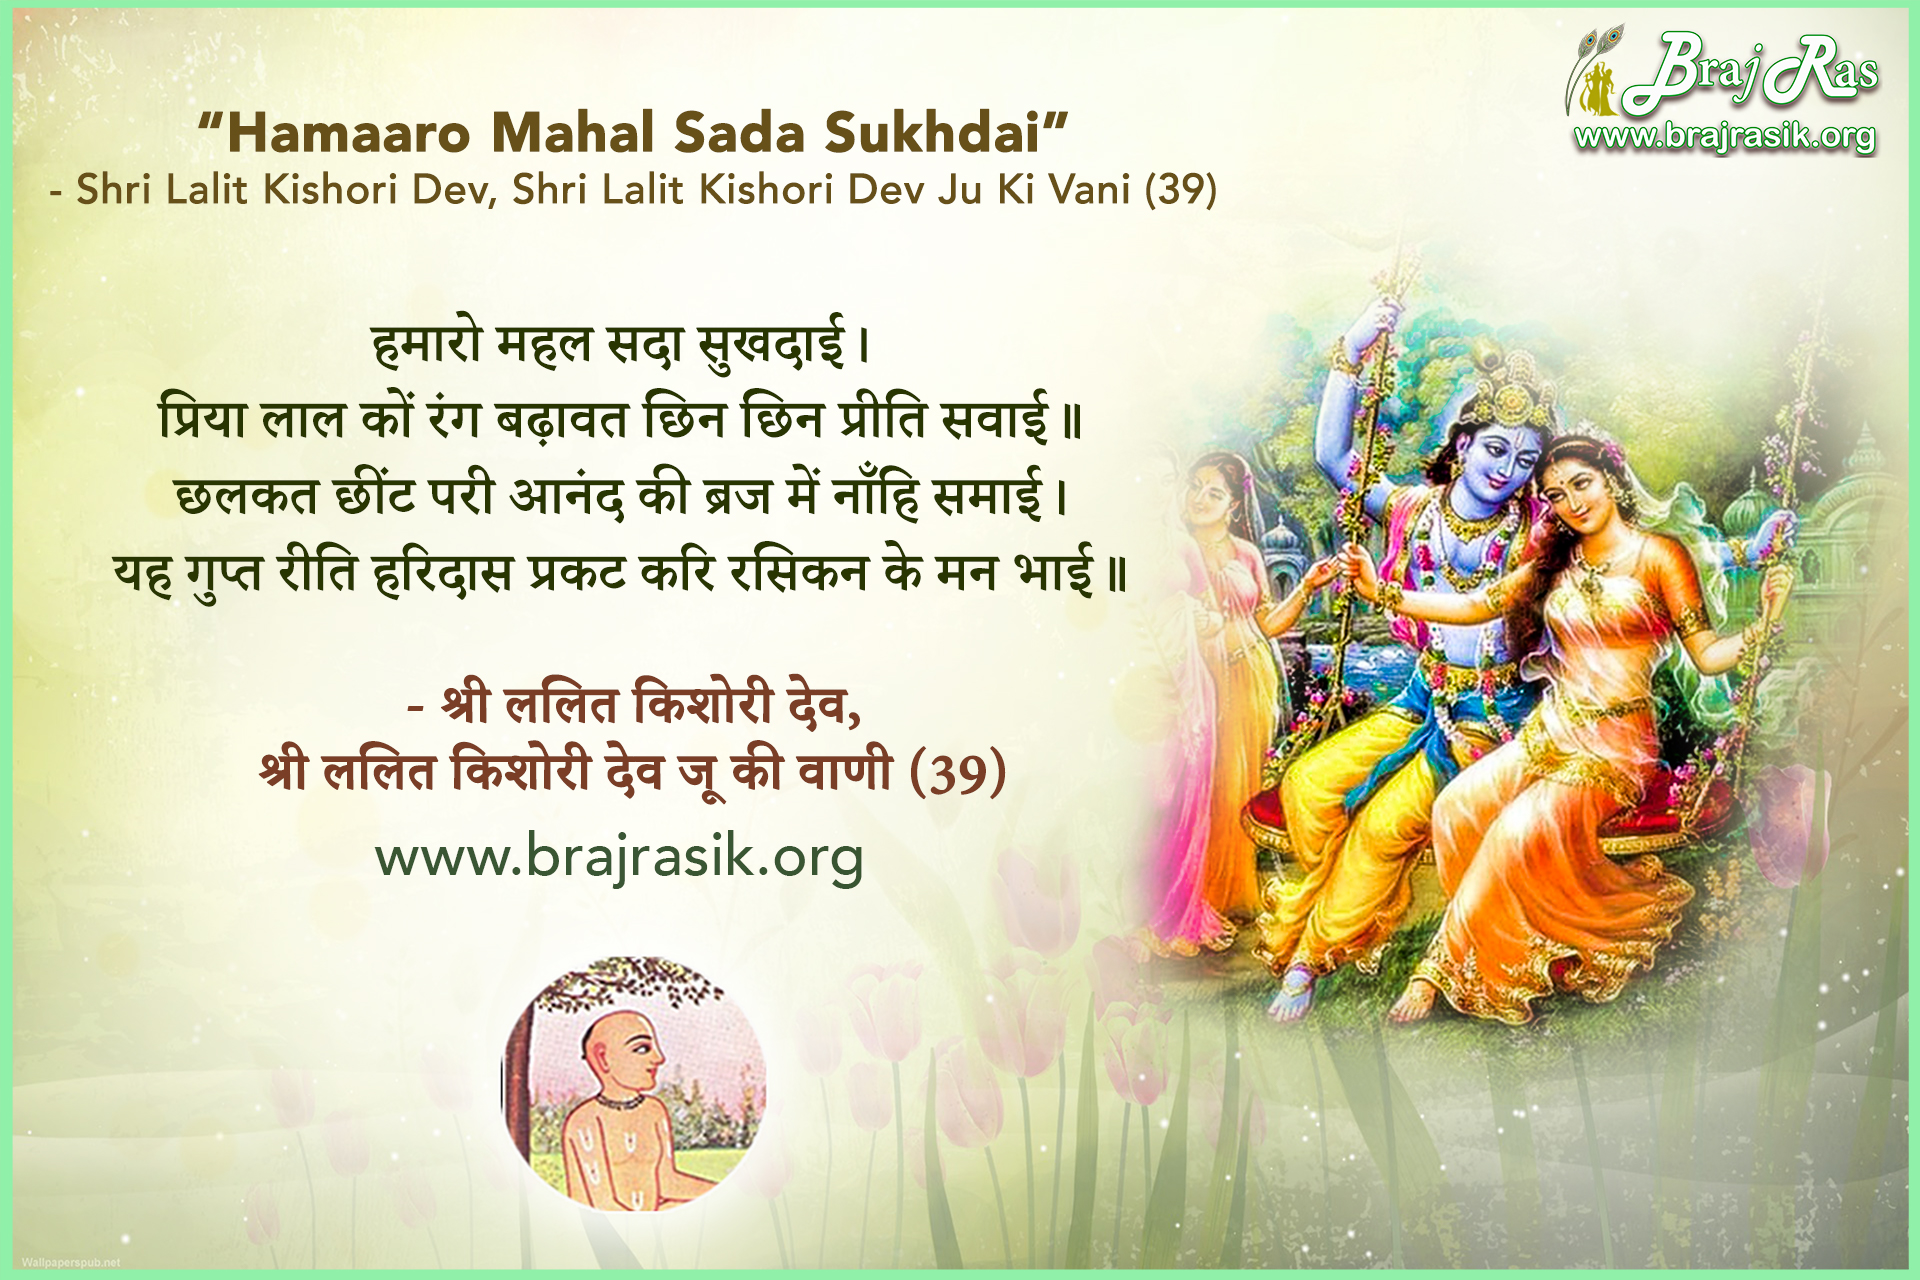 Hamaaro Mahal Sada Sukhdai - Shri Lalit Kishori Dev, Shri Lalit Kishori Dev Ju Ki Vani (39)